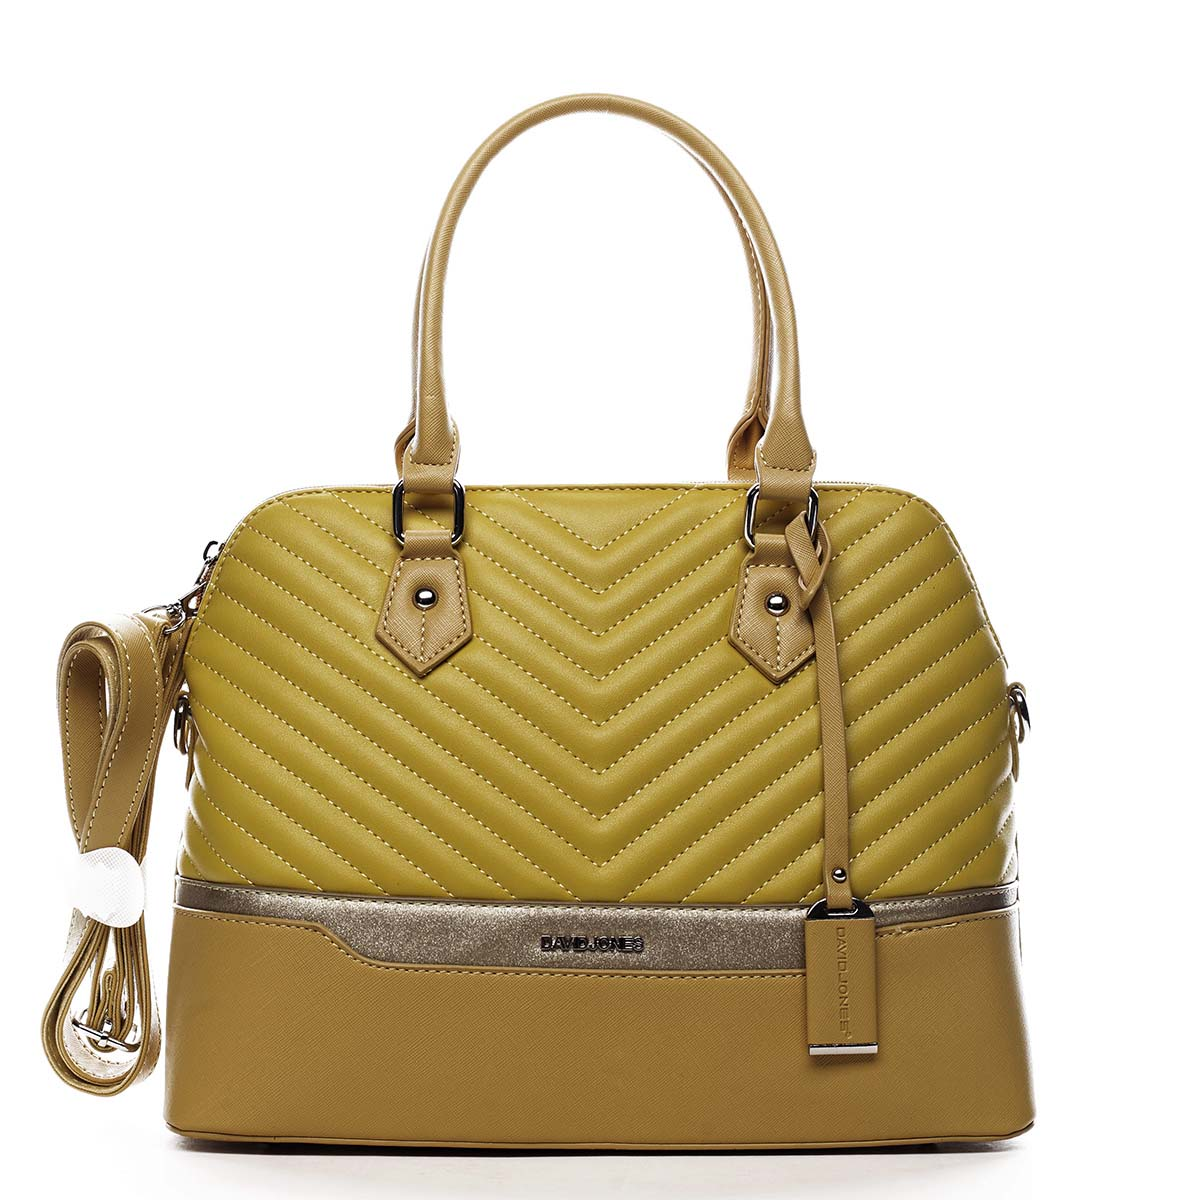 Dámska kabelka do ruky žltá - David Jones Roshel žltá